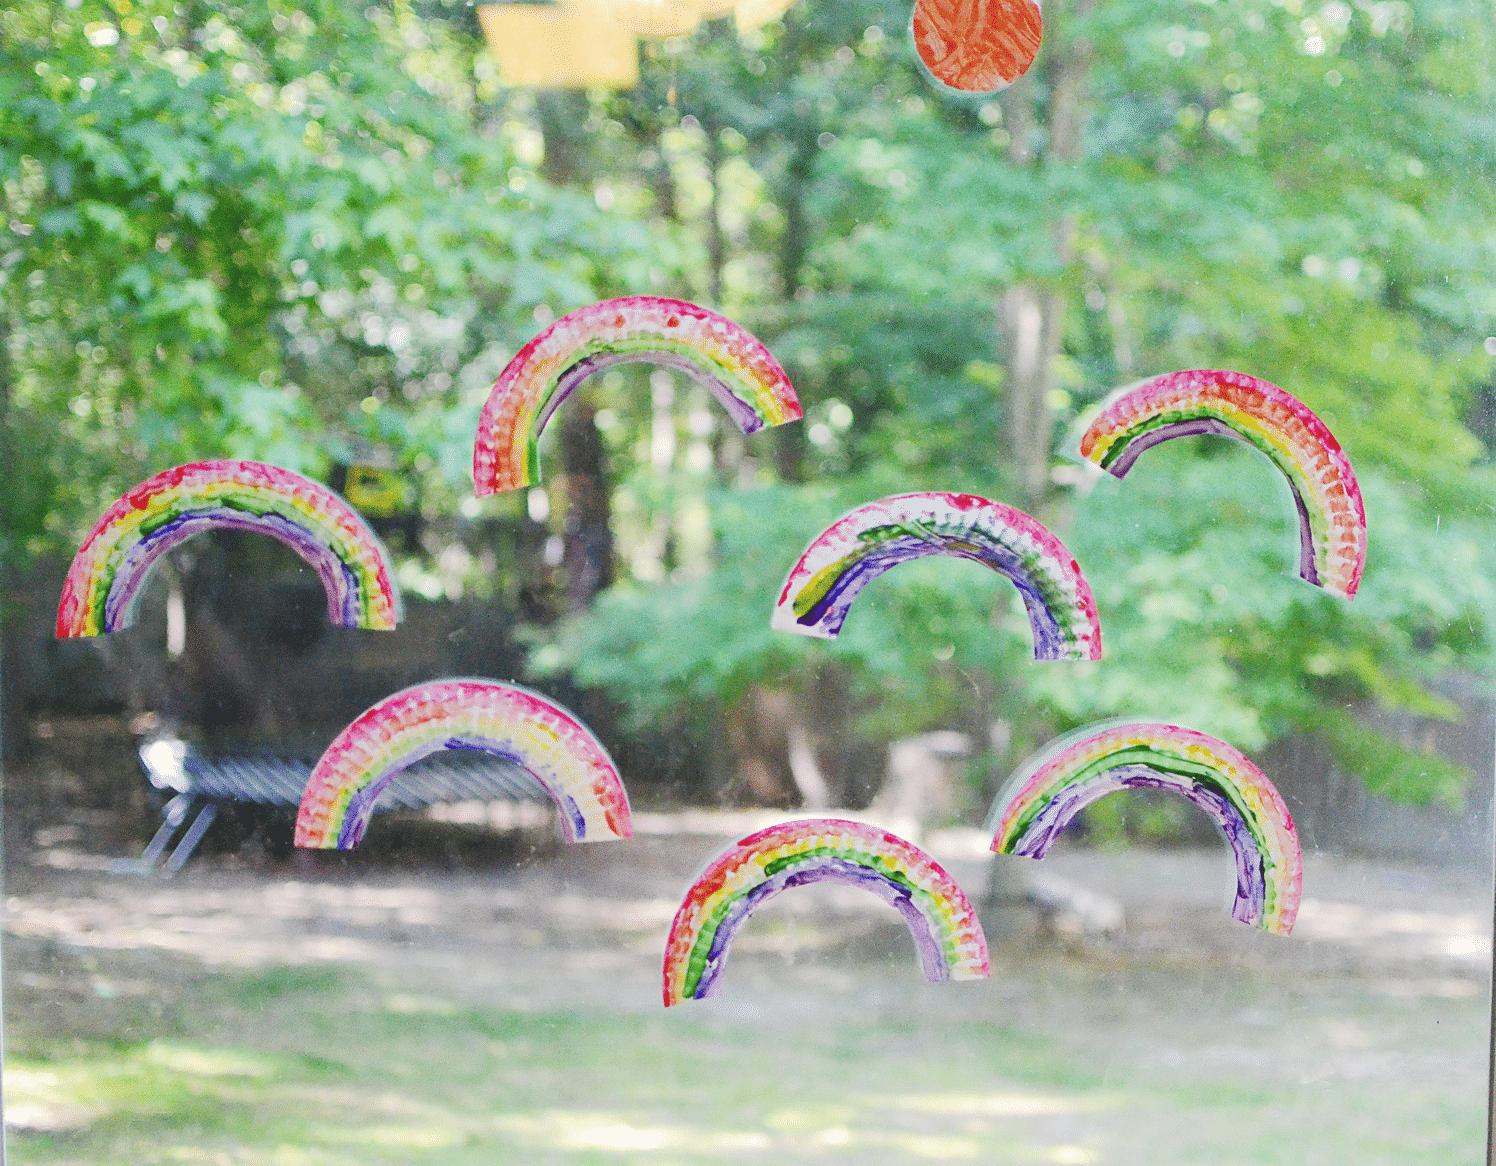 Rainbows to build teamwork